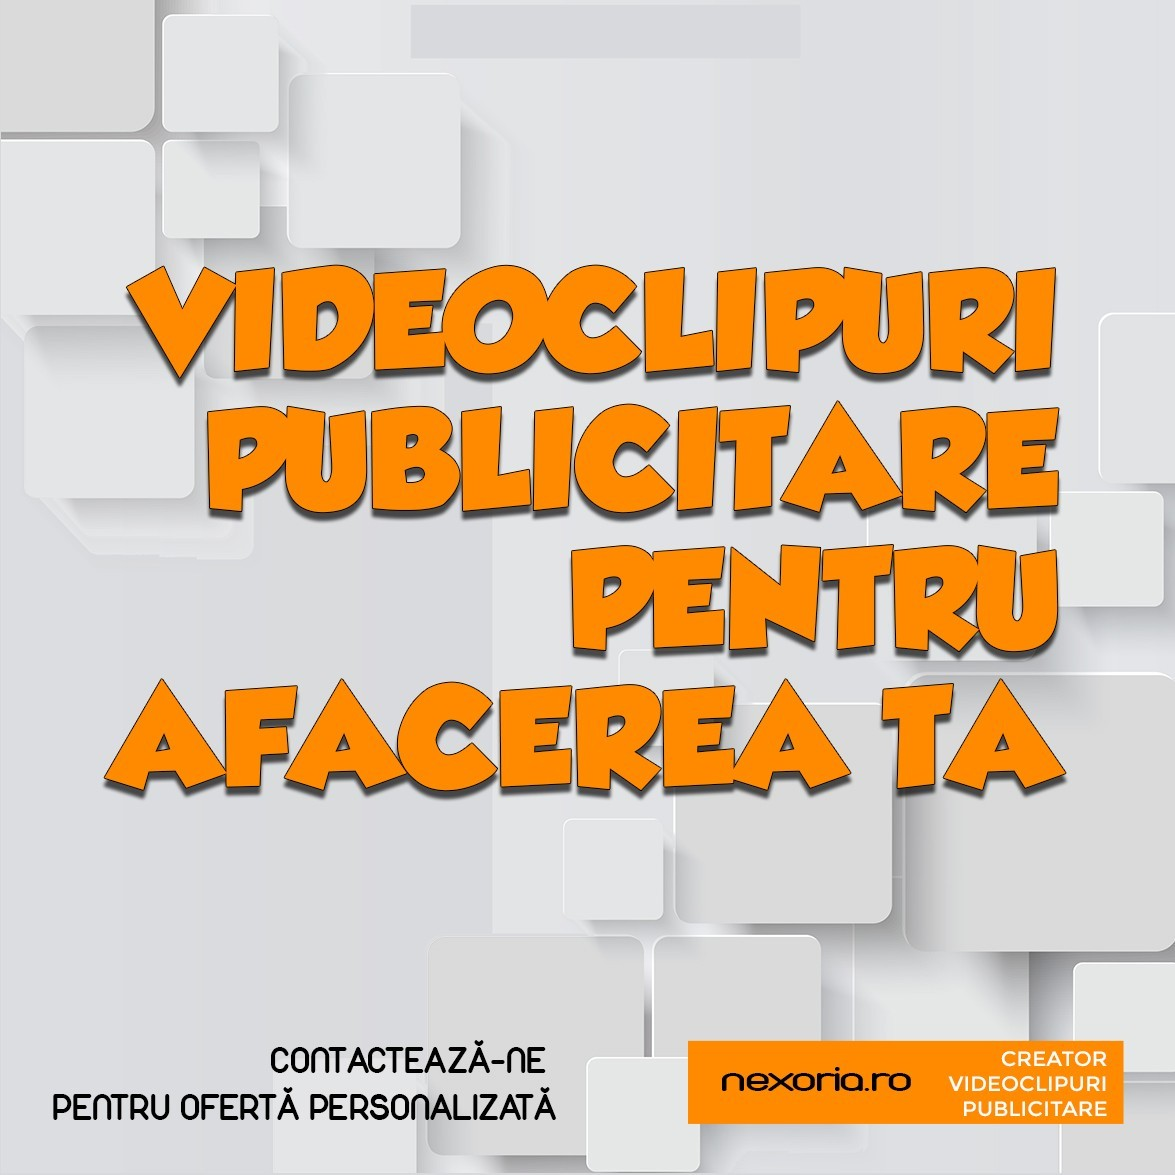 Creator VideoClipuri Publicitare